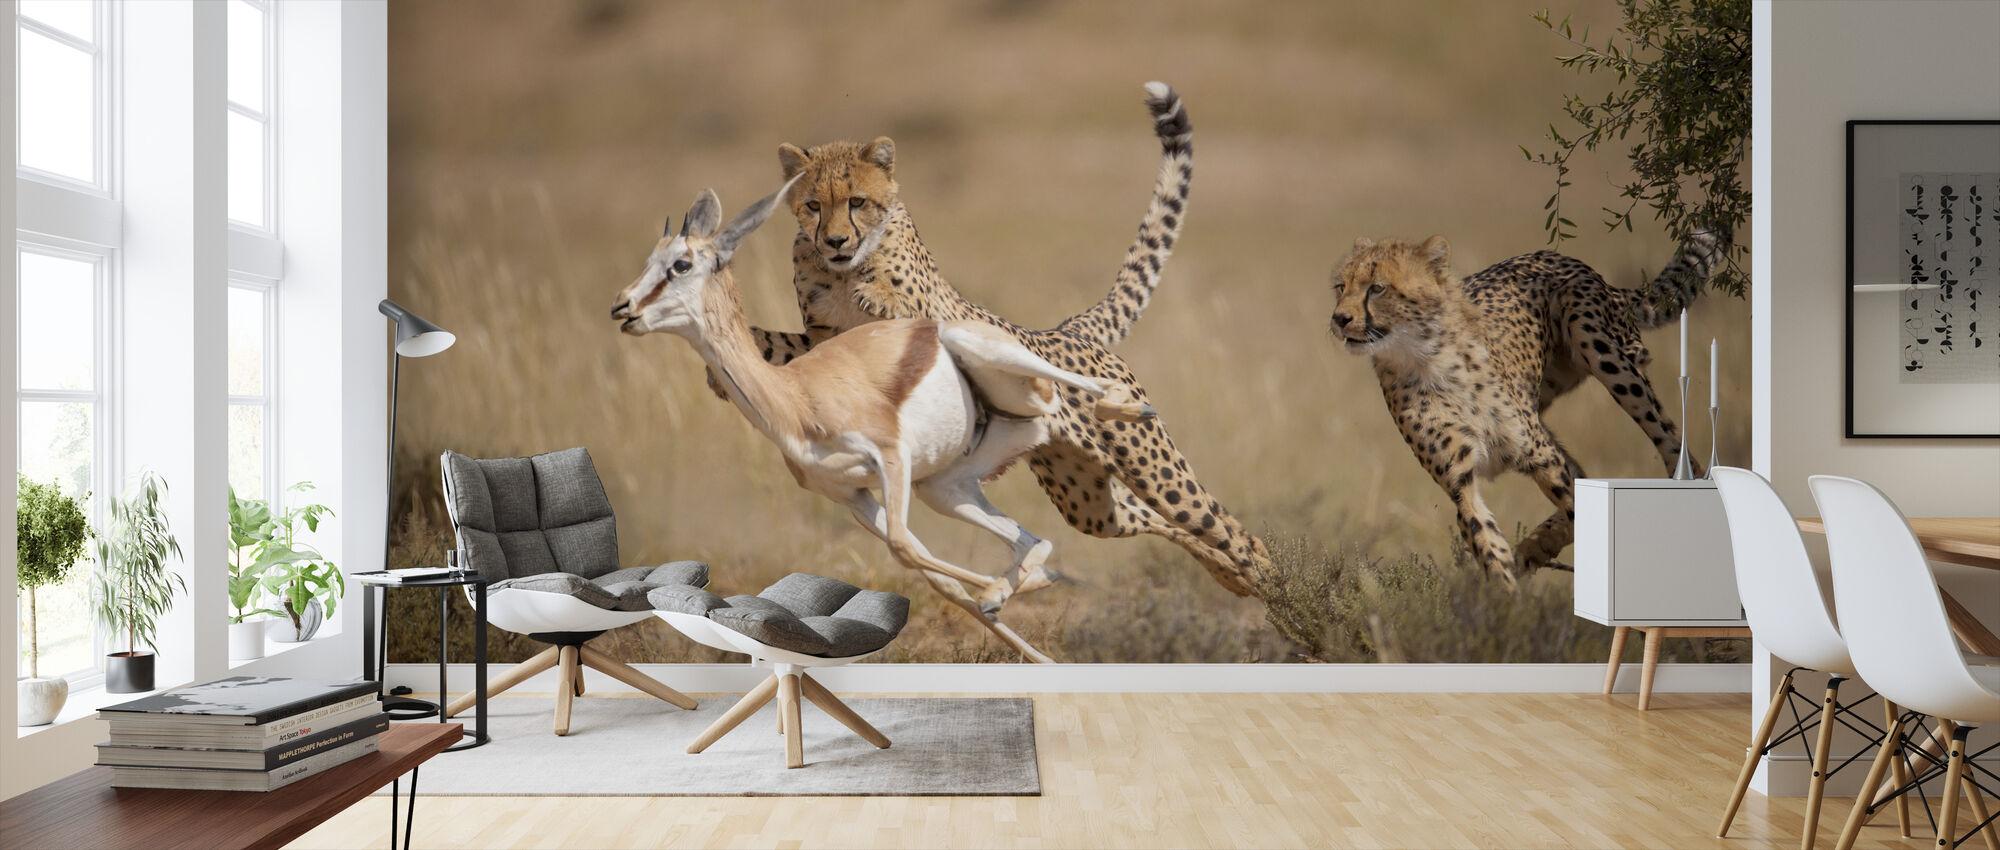 Jachtluipaard jacht Springbok - Behang - Woonkamer